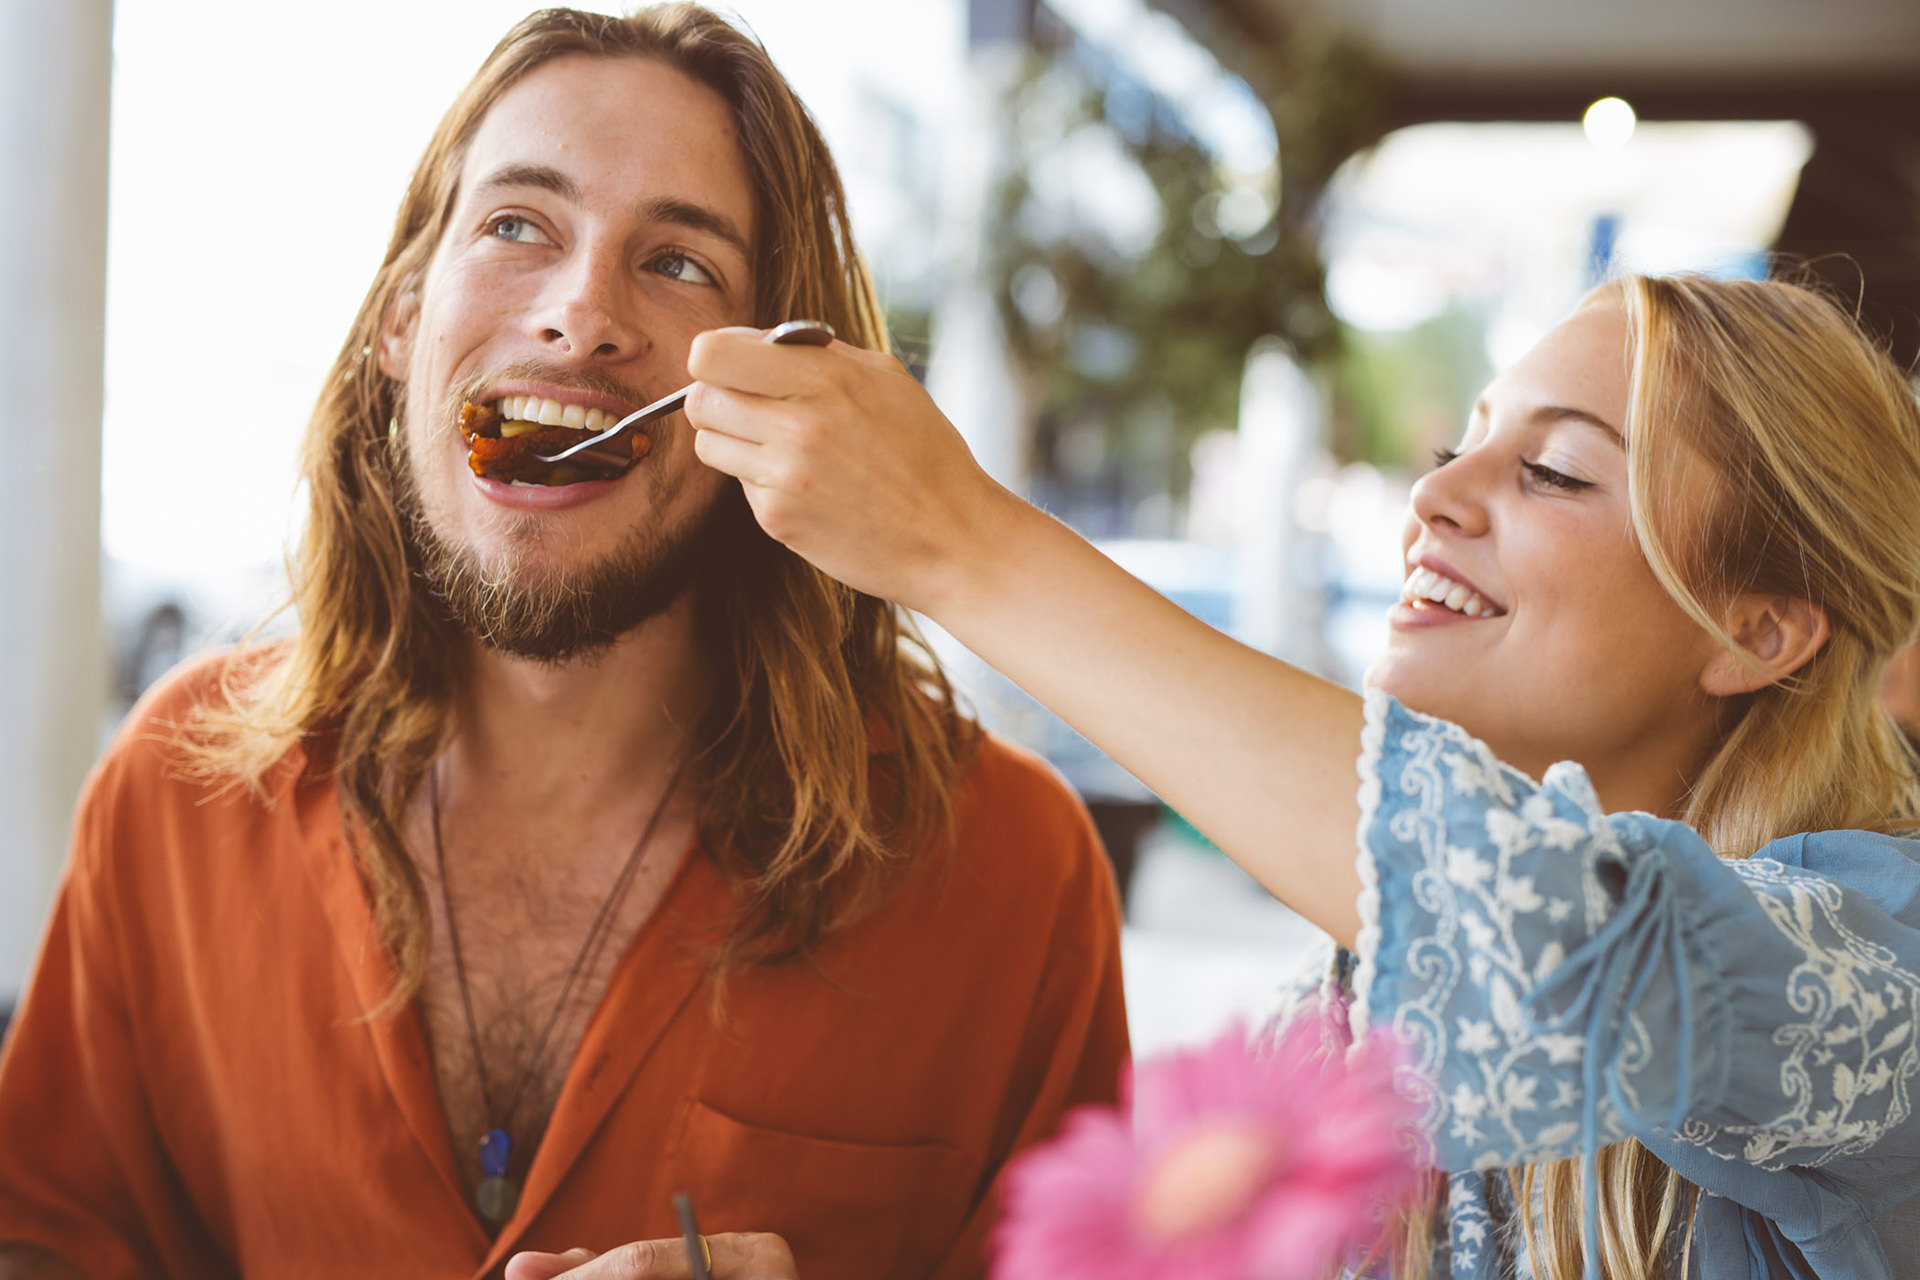 couple-feeding-food-fun-outside